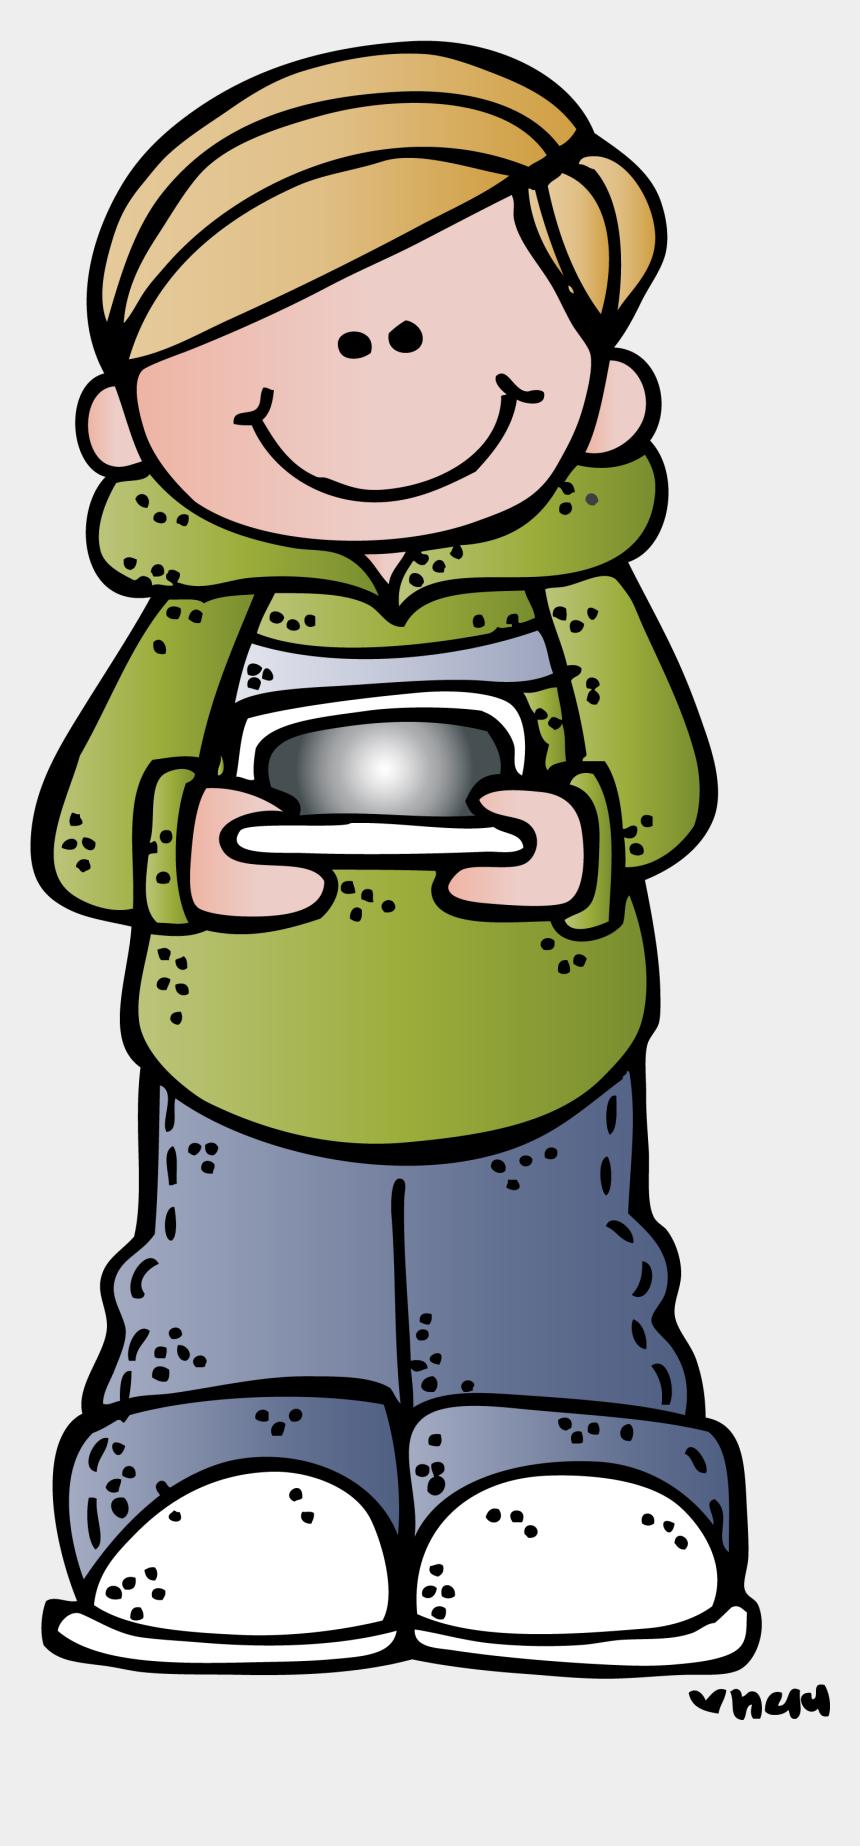 education clip art, Cartoons - Clipart Boy, School Clipart, Education Clipart, Class - Clipart Melonheadz Boy